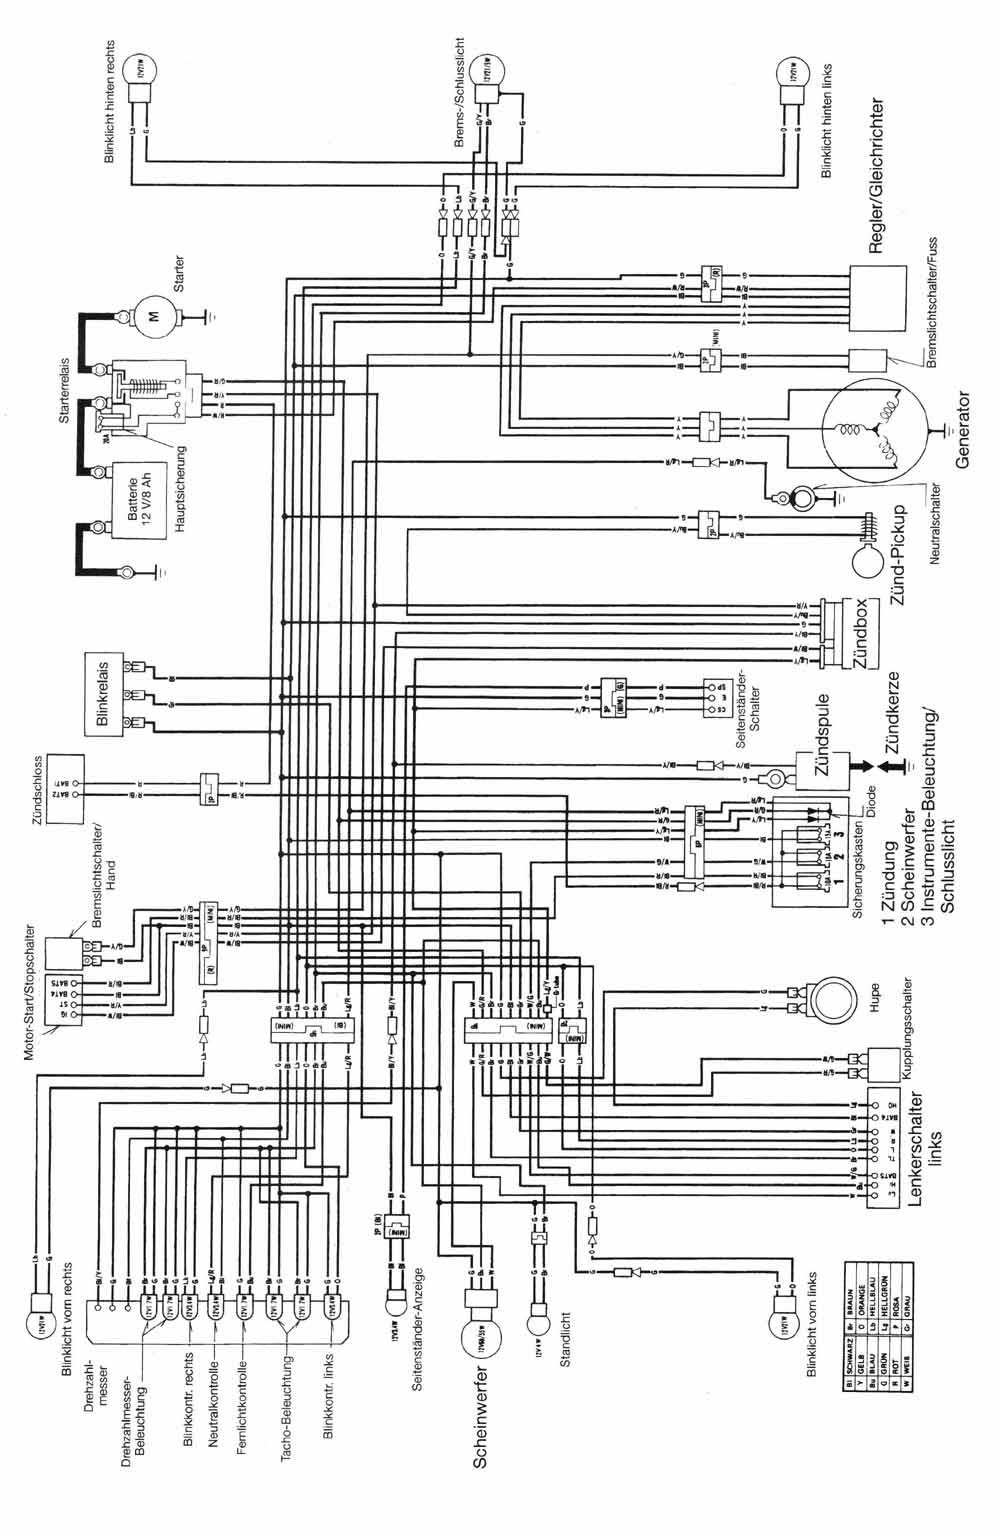 hight resolution of honda dominator wiring diagram wiring diagram third level verucci wiring diagram honda dominator wiring diagram